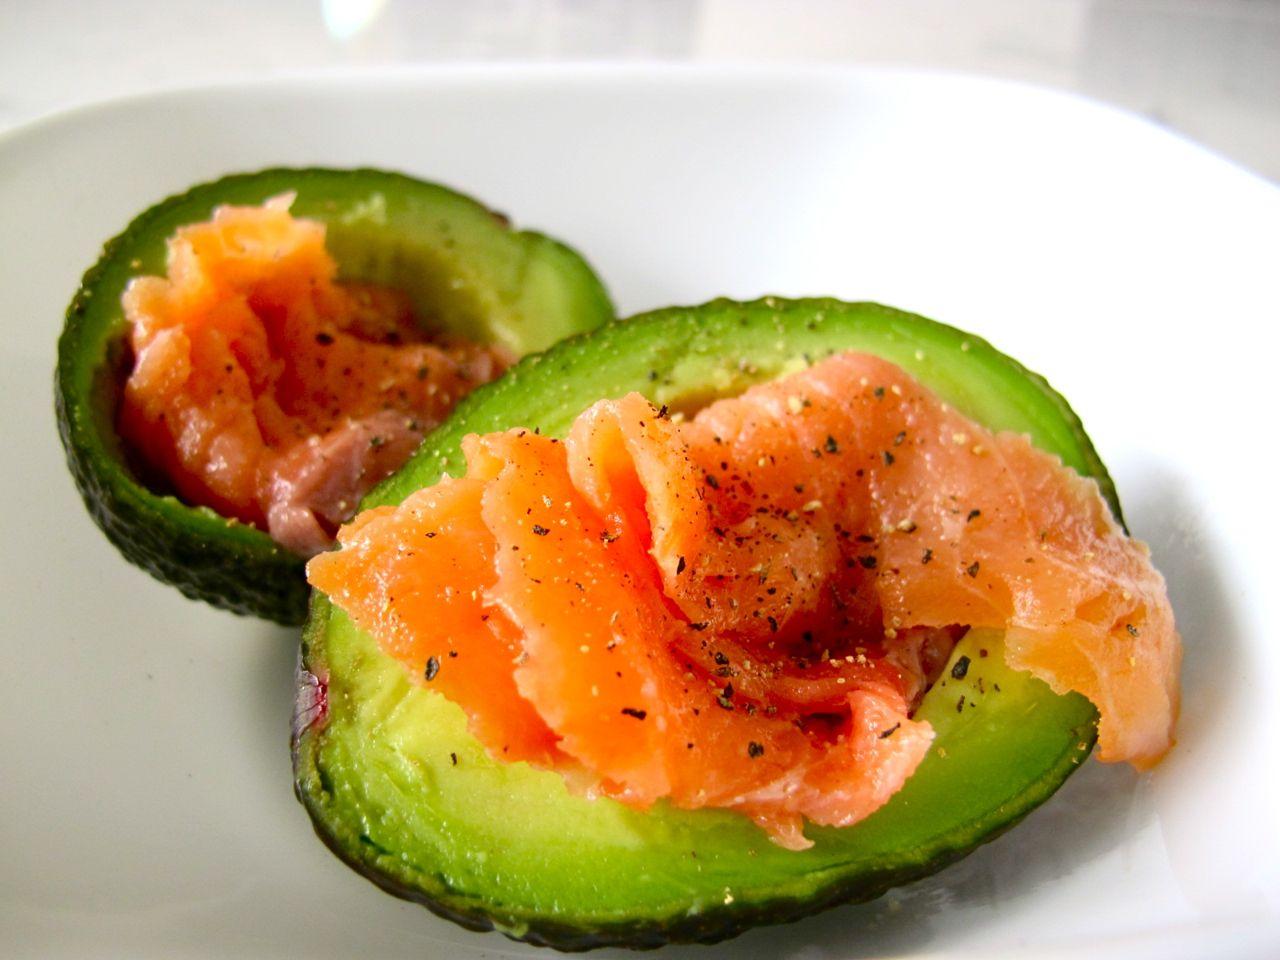 Avocado and Smoked Salmon | Eat Clean Recipes | Pinterest